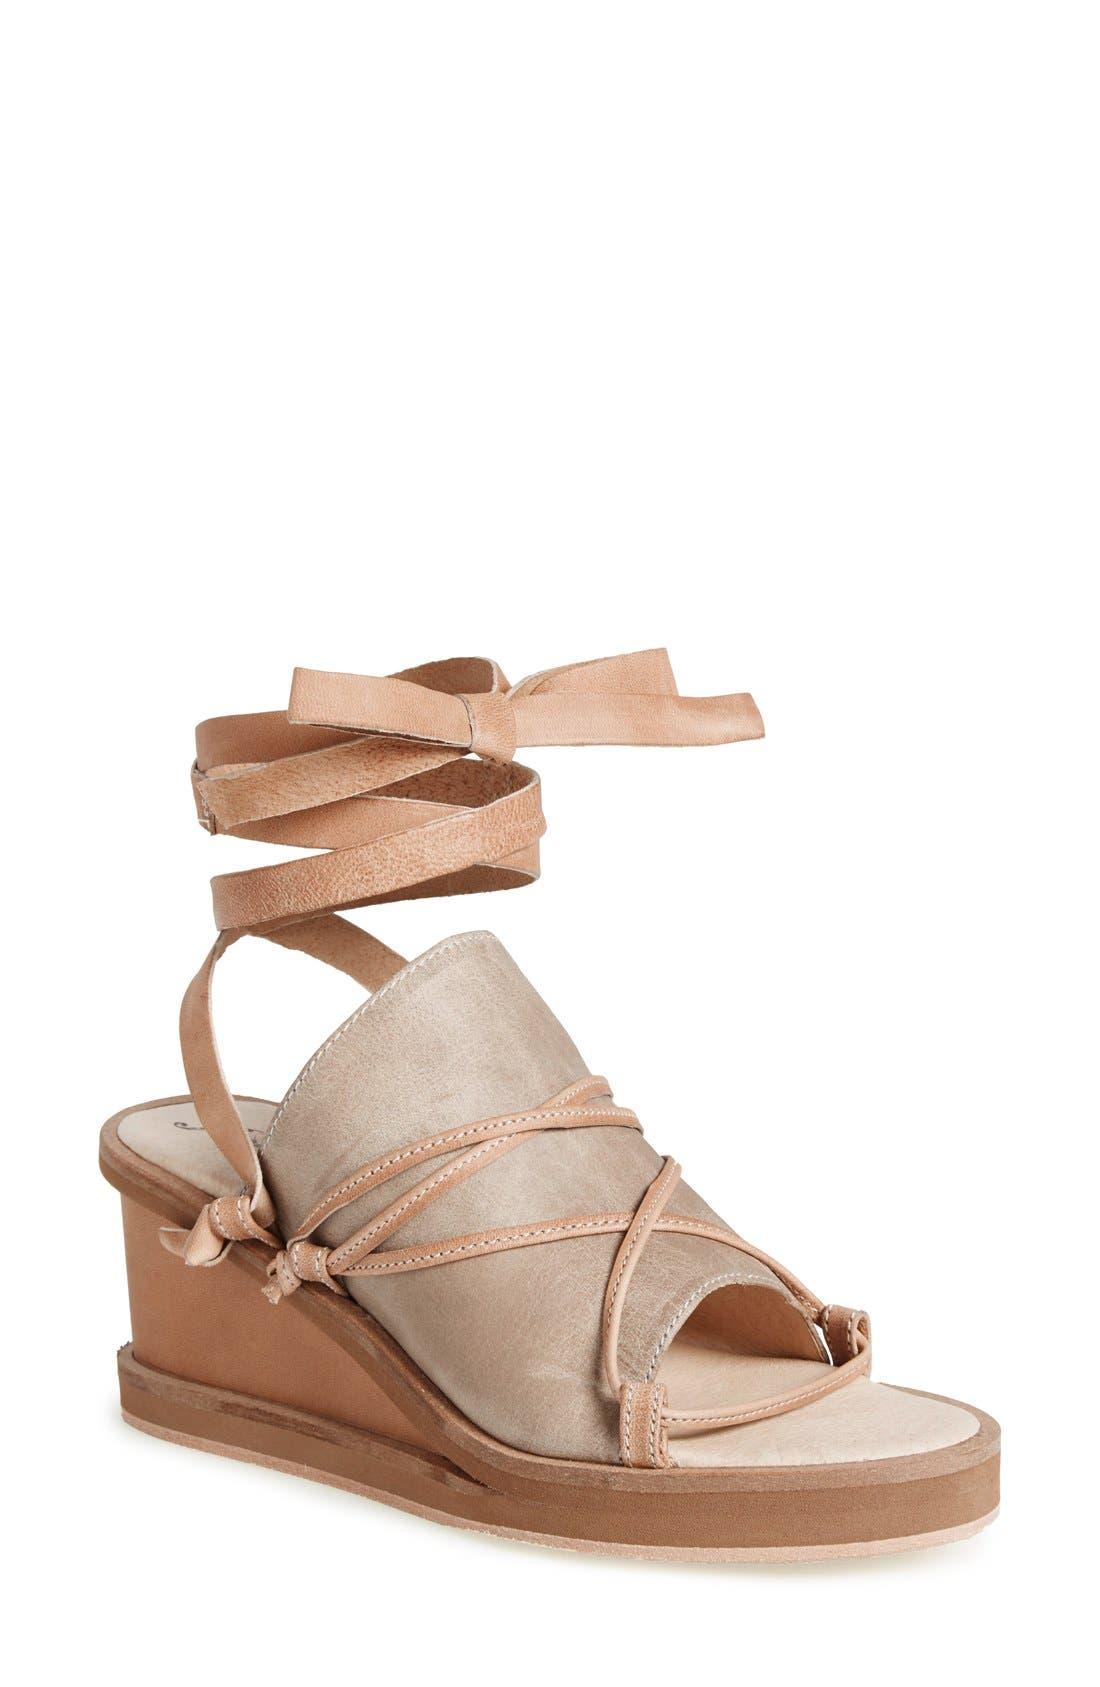 Alternate Image 1 Selected - Free People 'Bowery' Ankle Tie Wedge Sandal